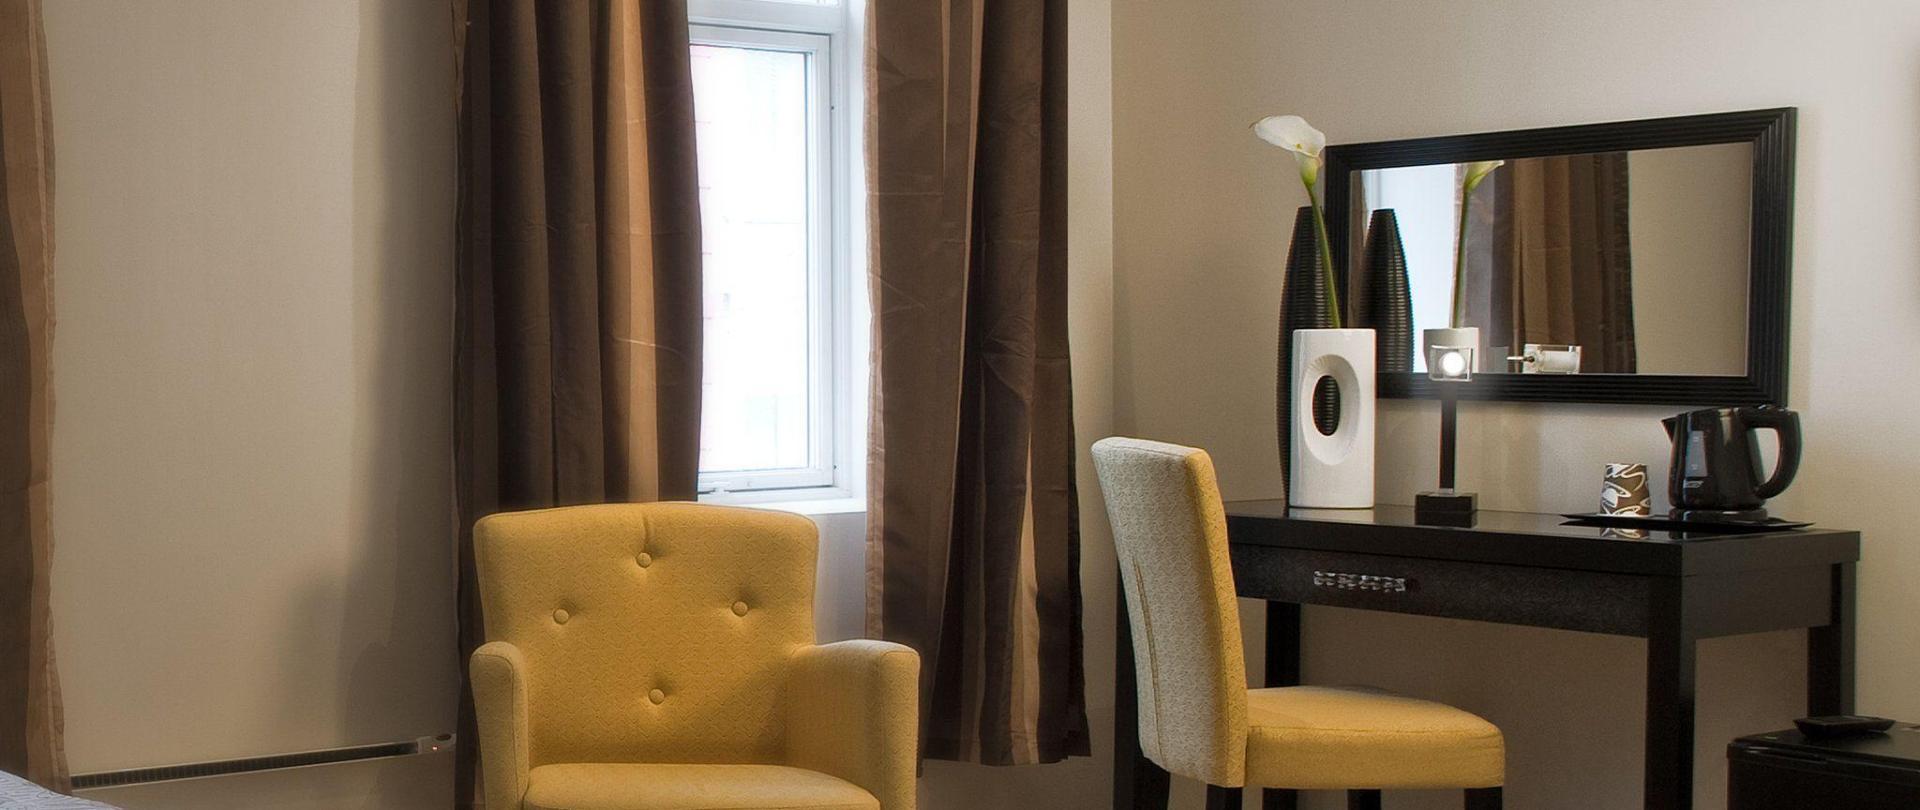 basic-hotel-bergen-001.jpg